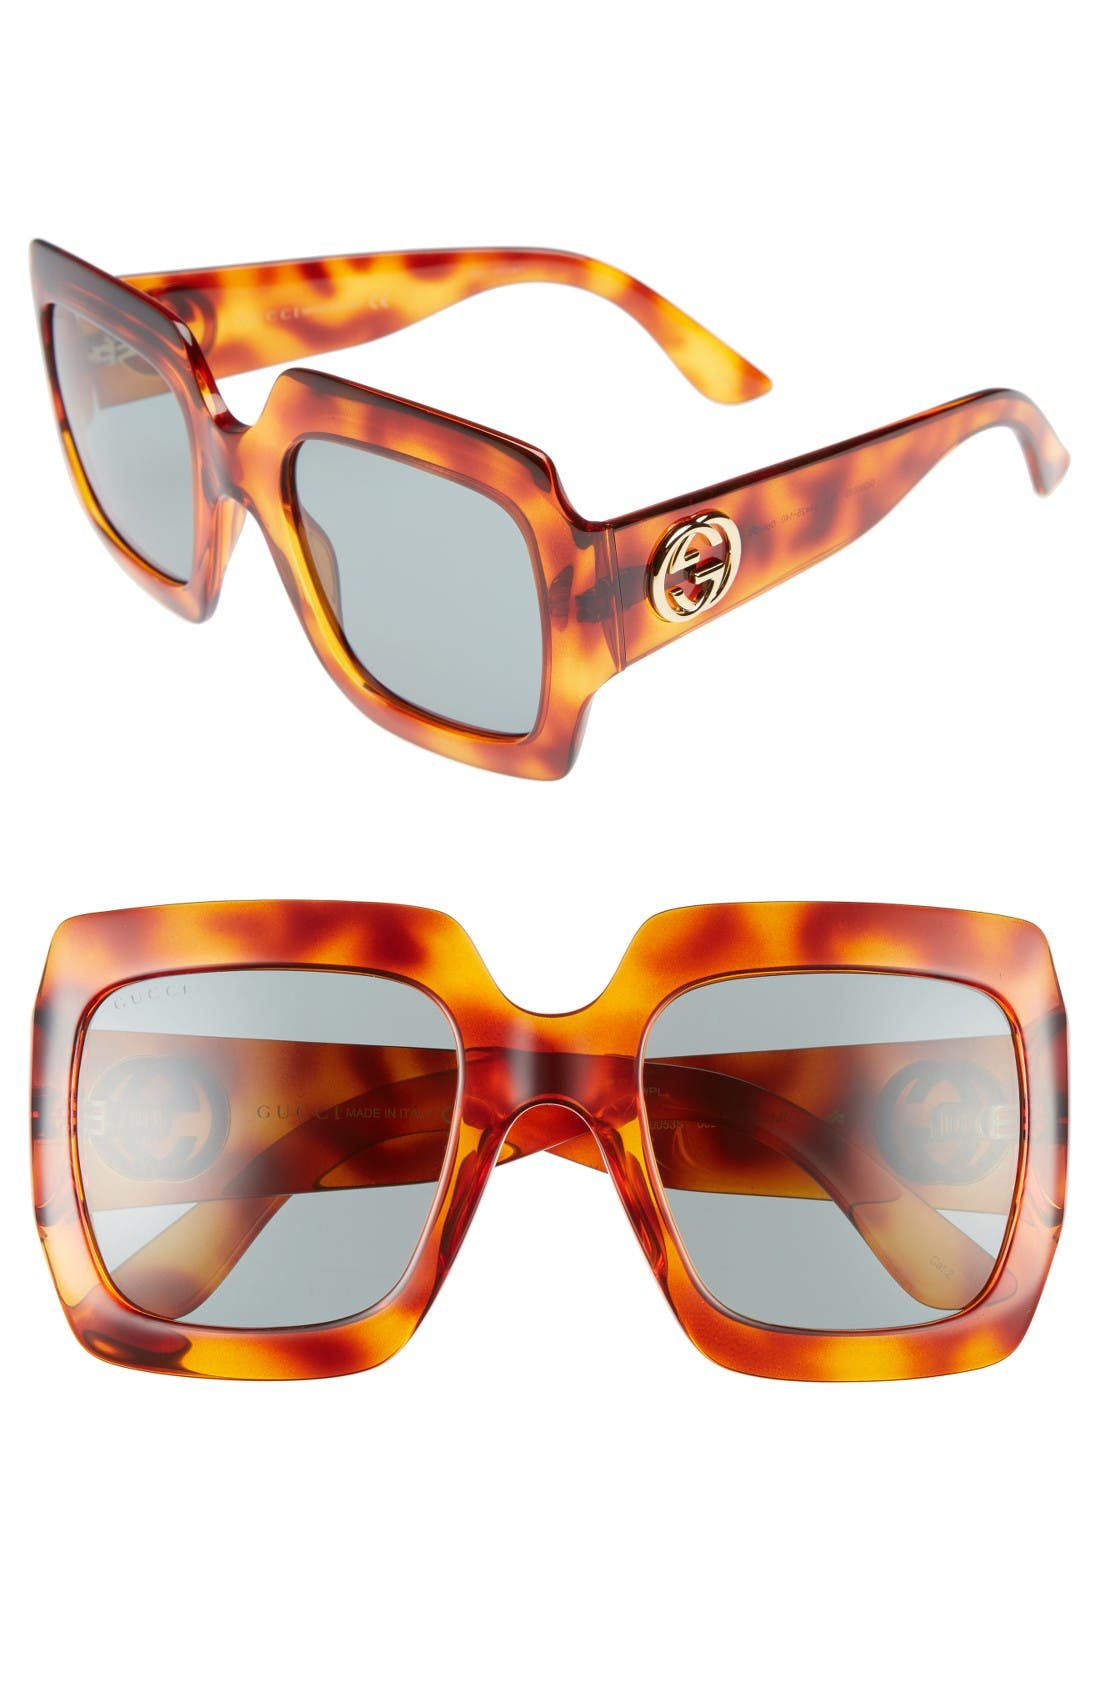 Alternate Image 1 Selected - Gucci 54mm Square Sunglasses